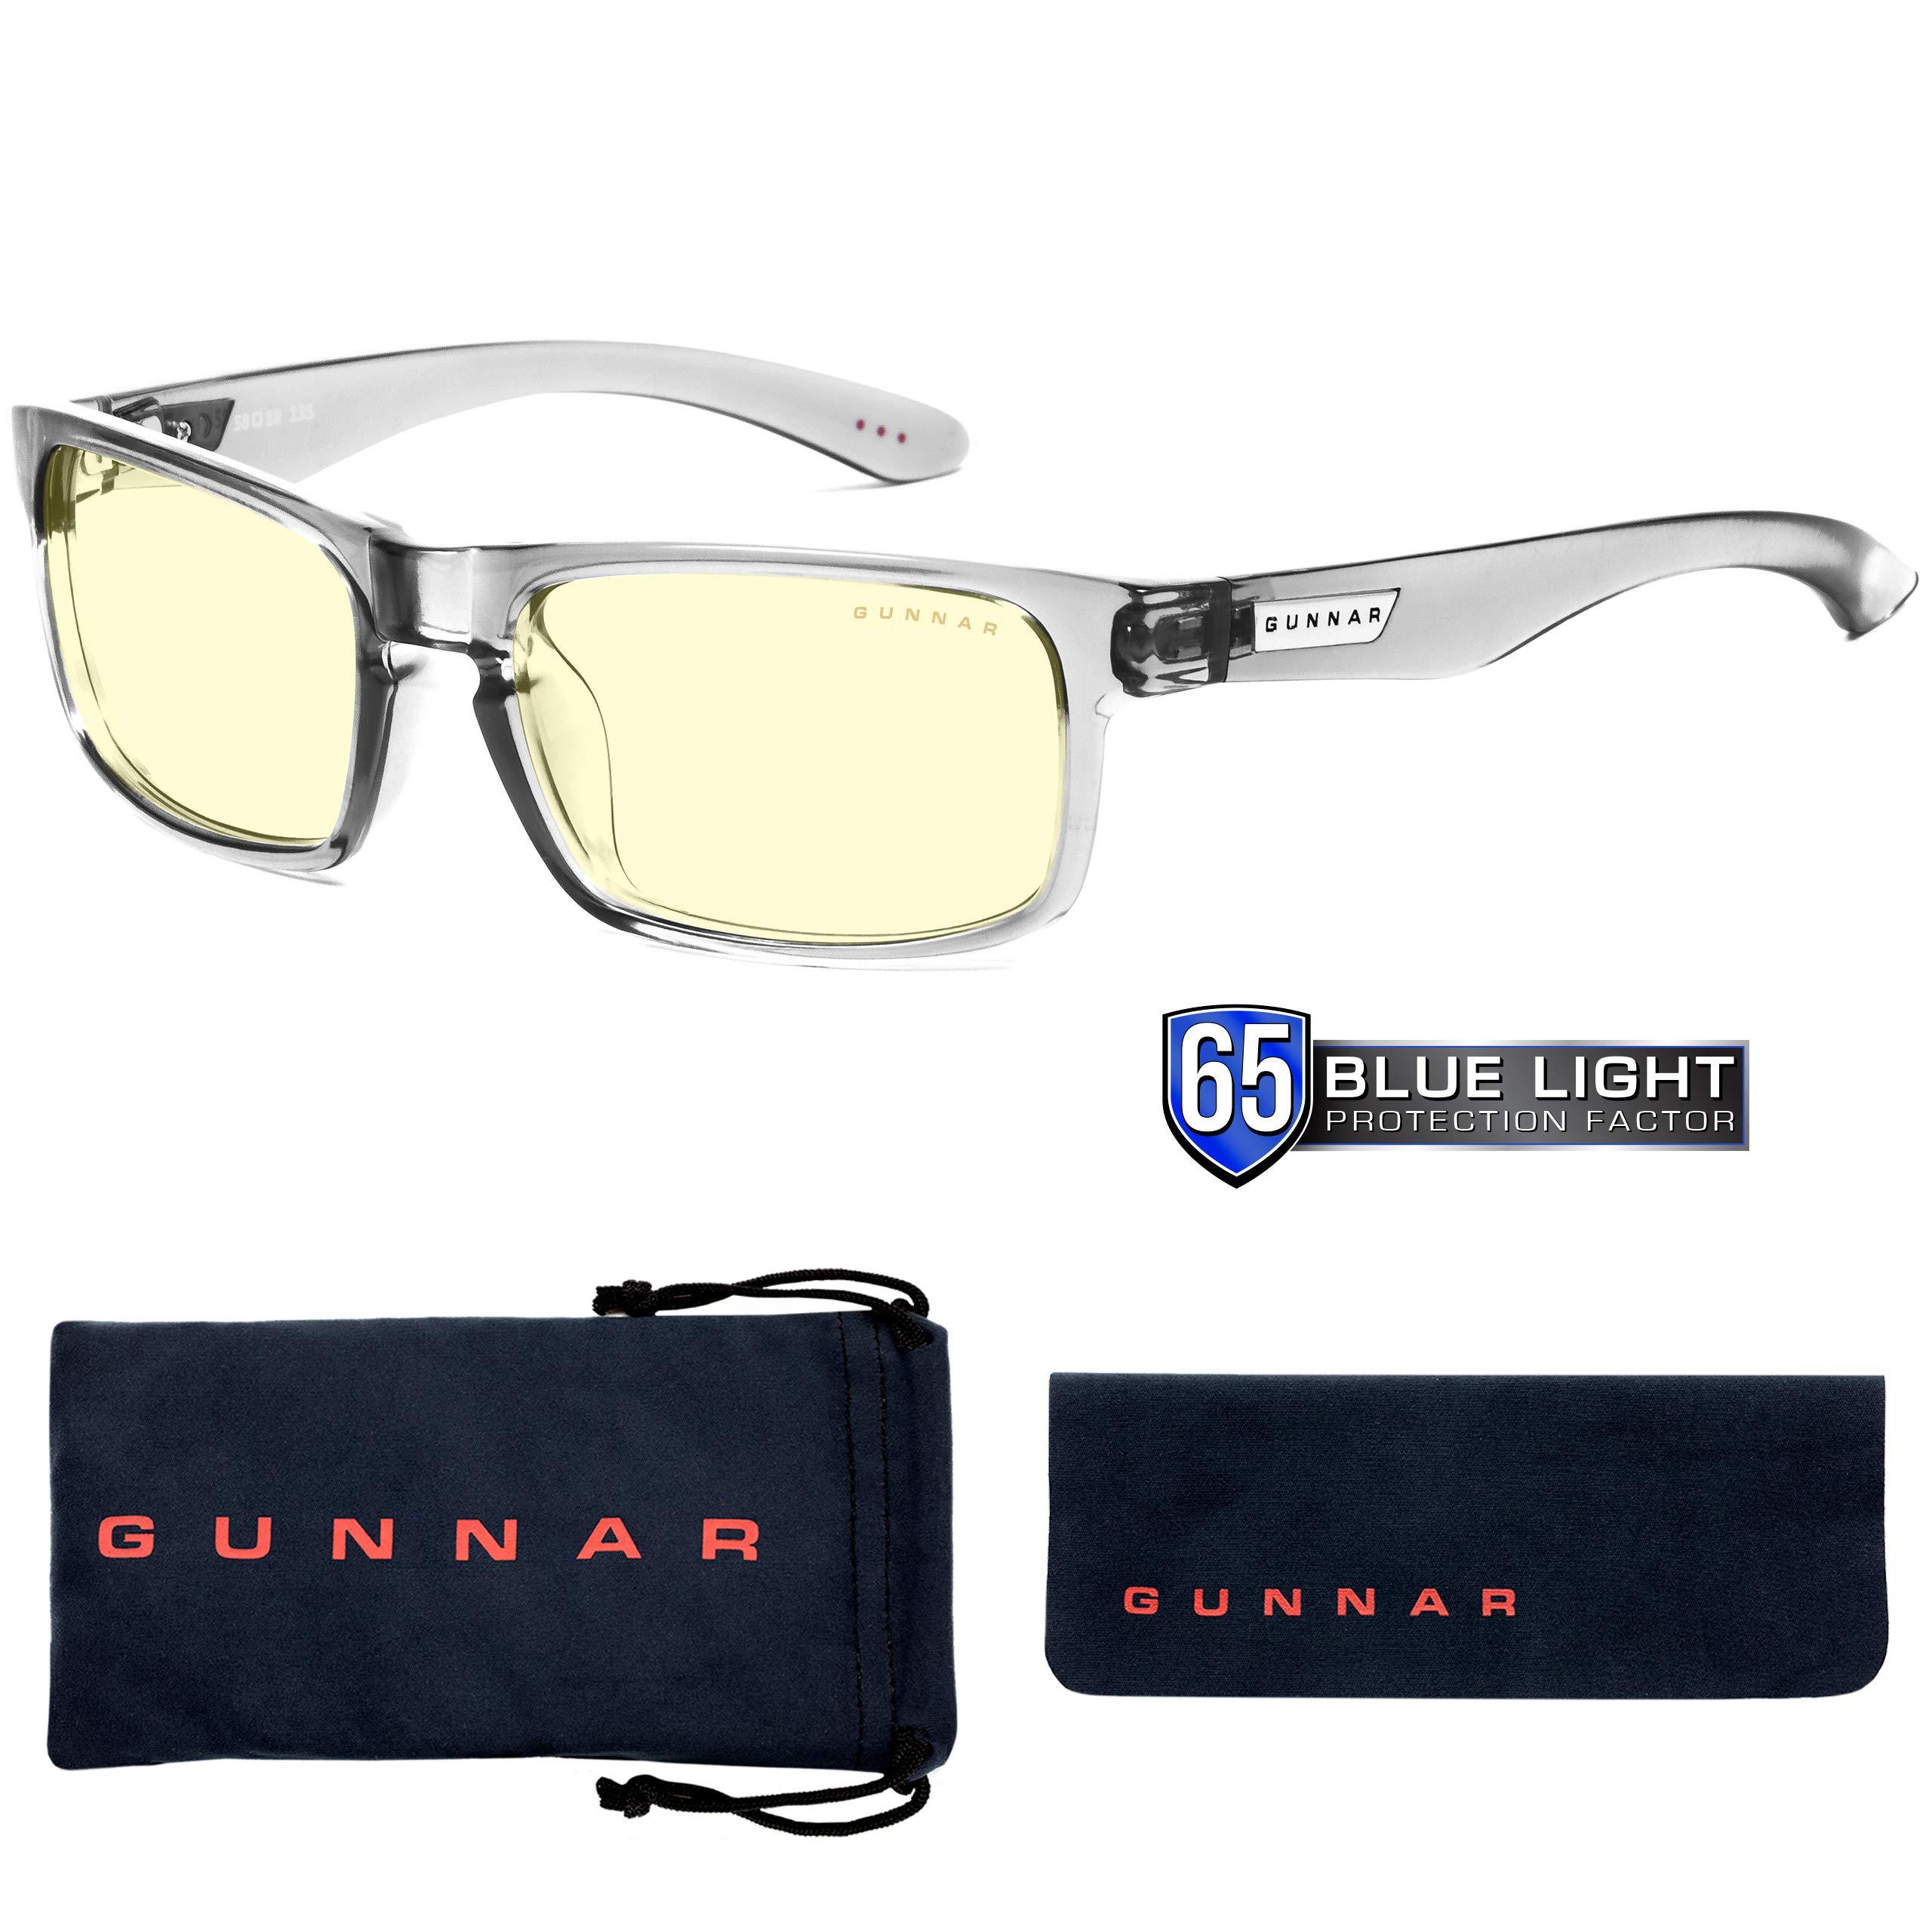 enigma 电脑眼镜–BLOCK 蓝色灯,防眩光, minimize 数码 EYE strain– headaches ,降低眼部和更好